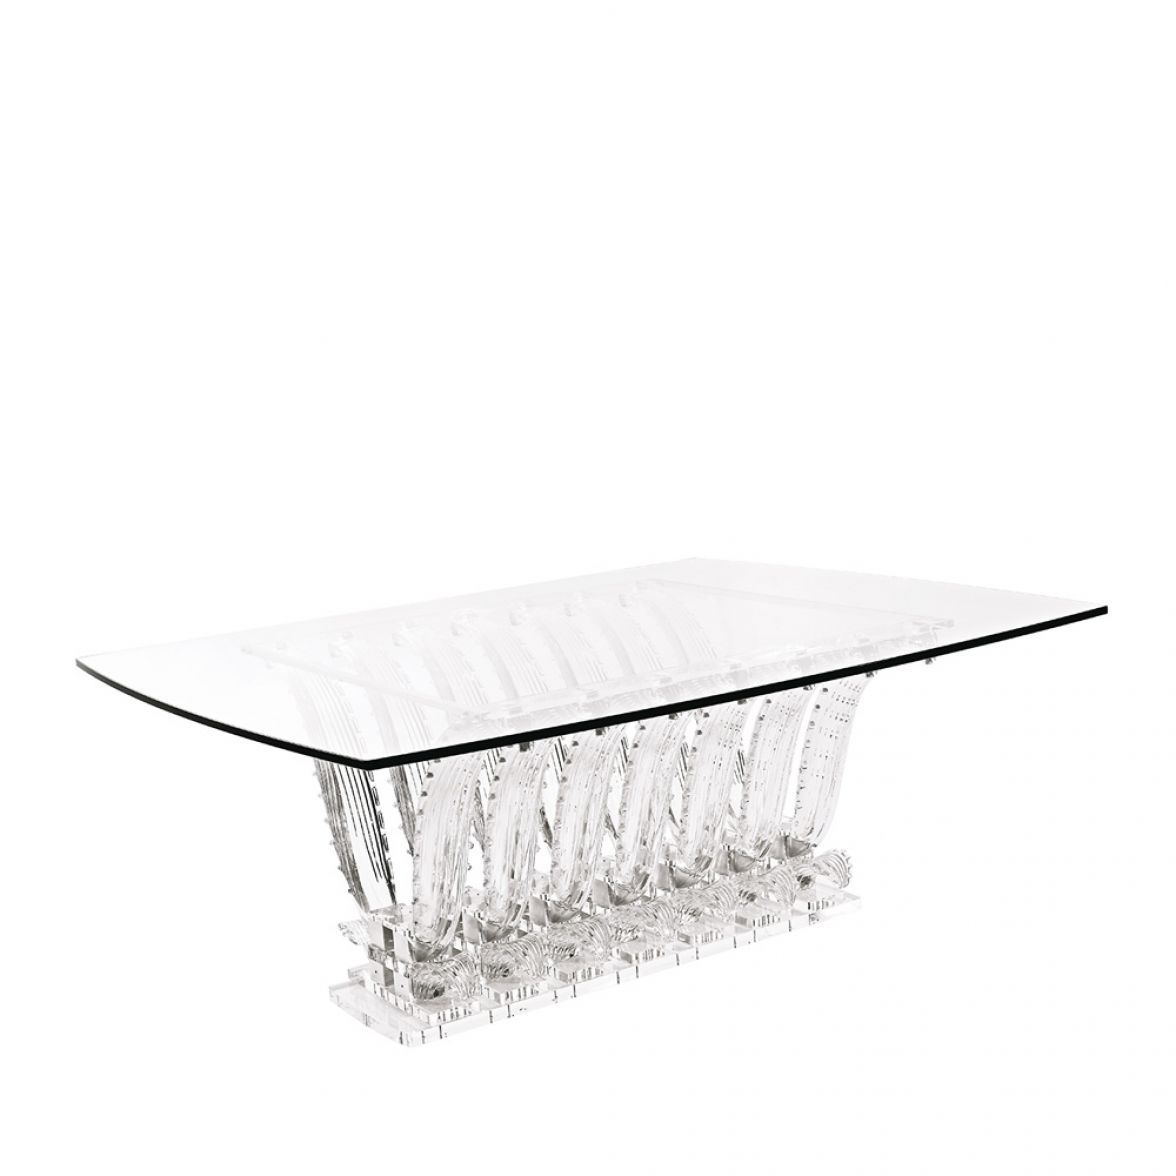 Cactus table